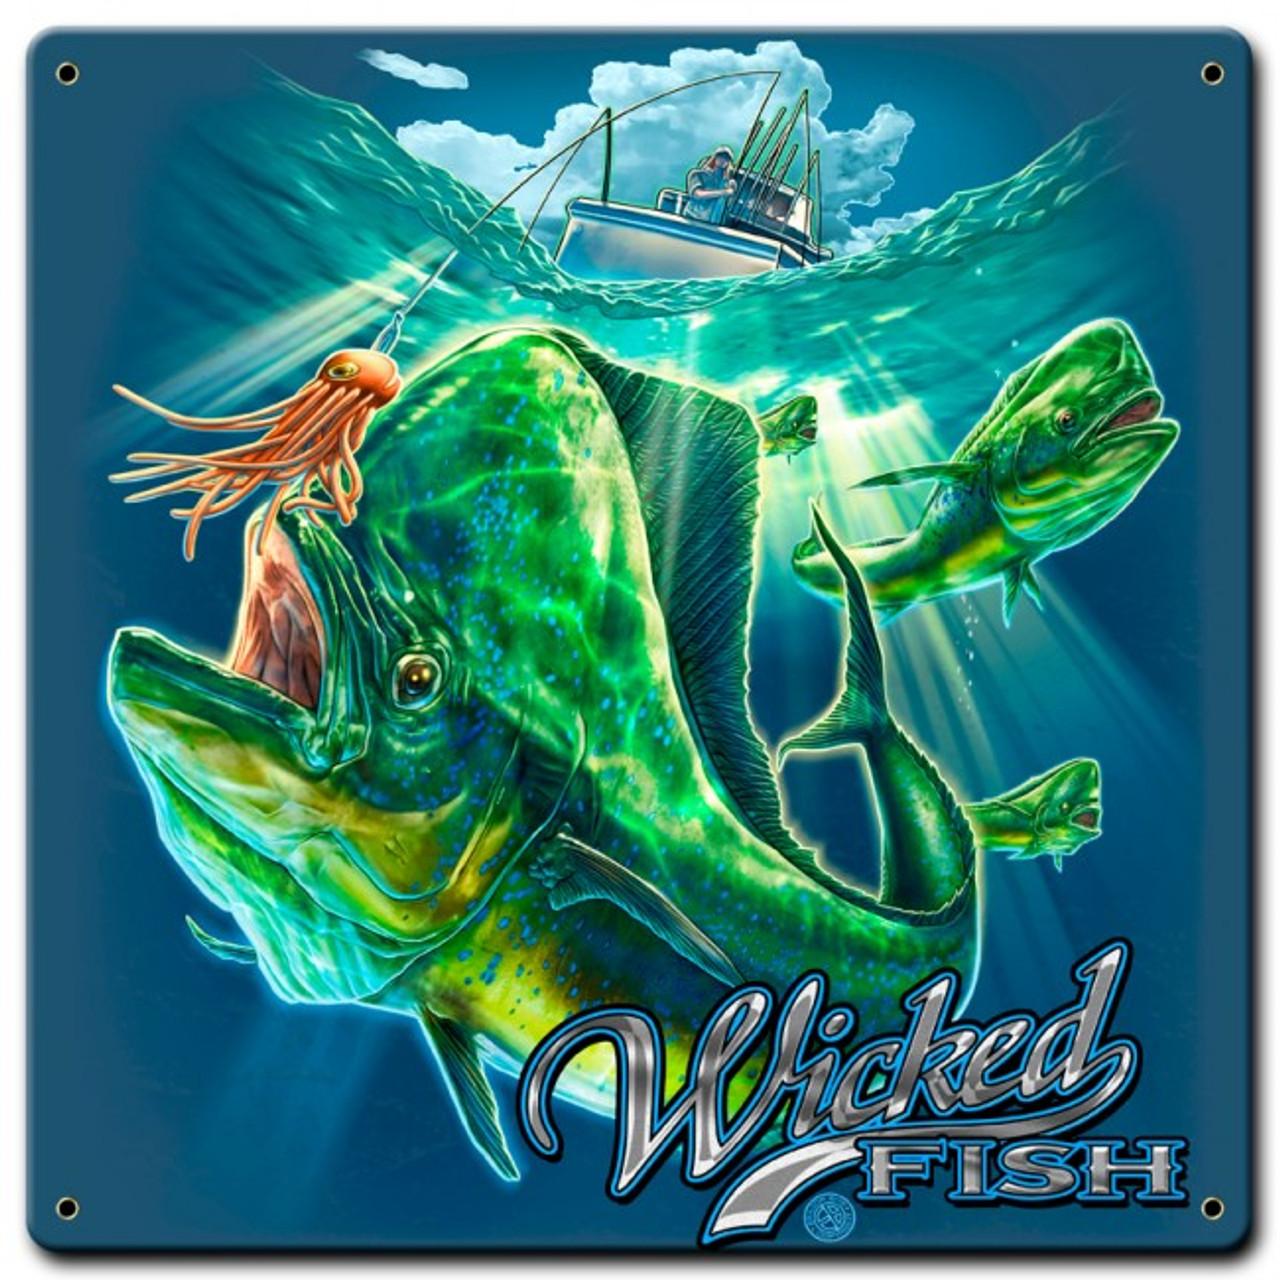 Fishing Mahi Wicked Fish Metal Sign 12 x 12 Inches